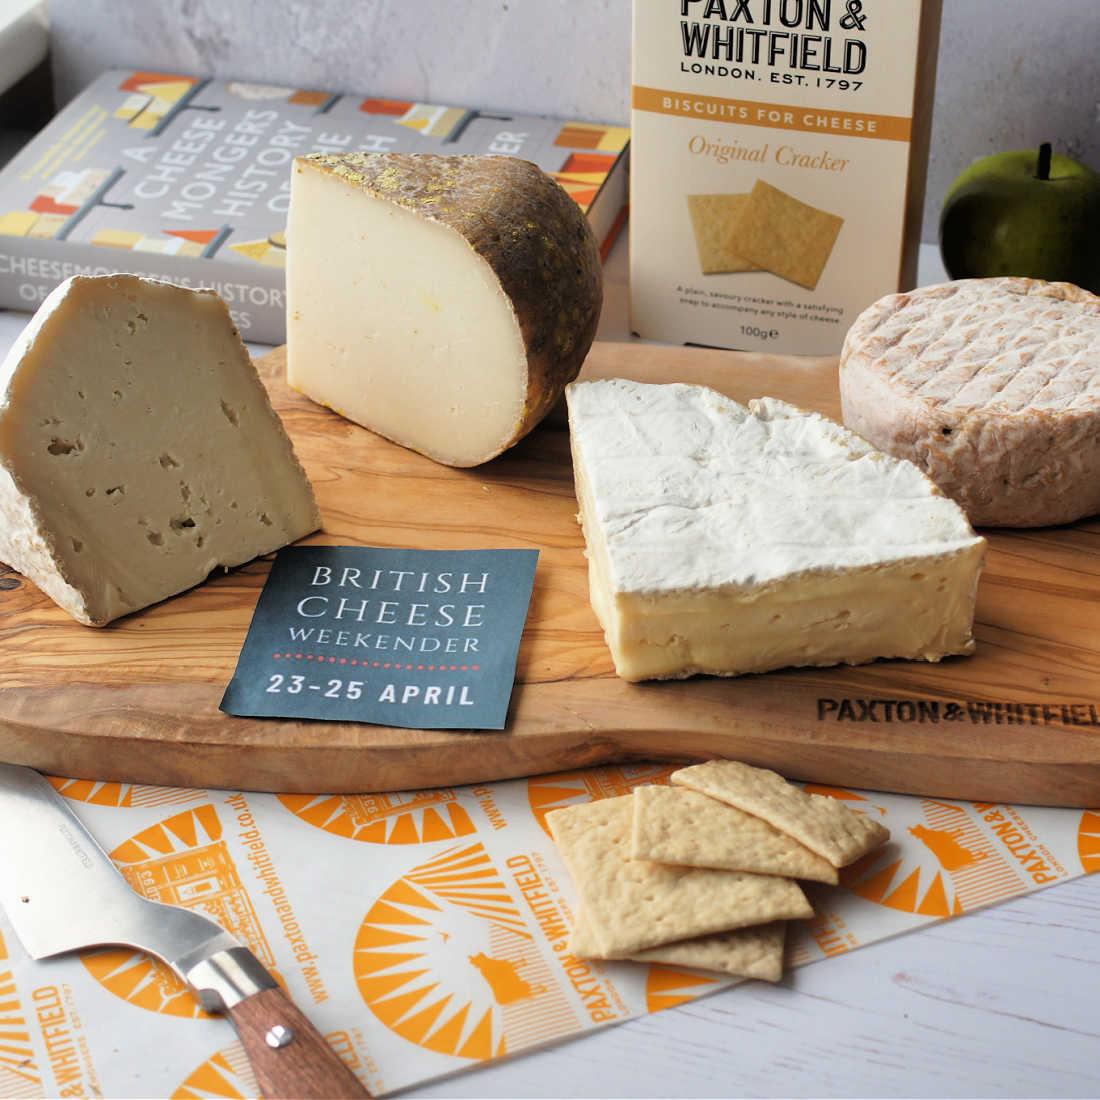 British-Cheese-Weekender-Cheese-Pack-2020-Low-Res